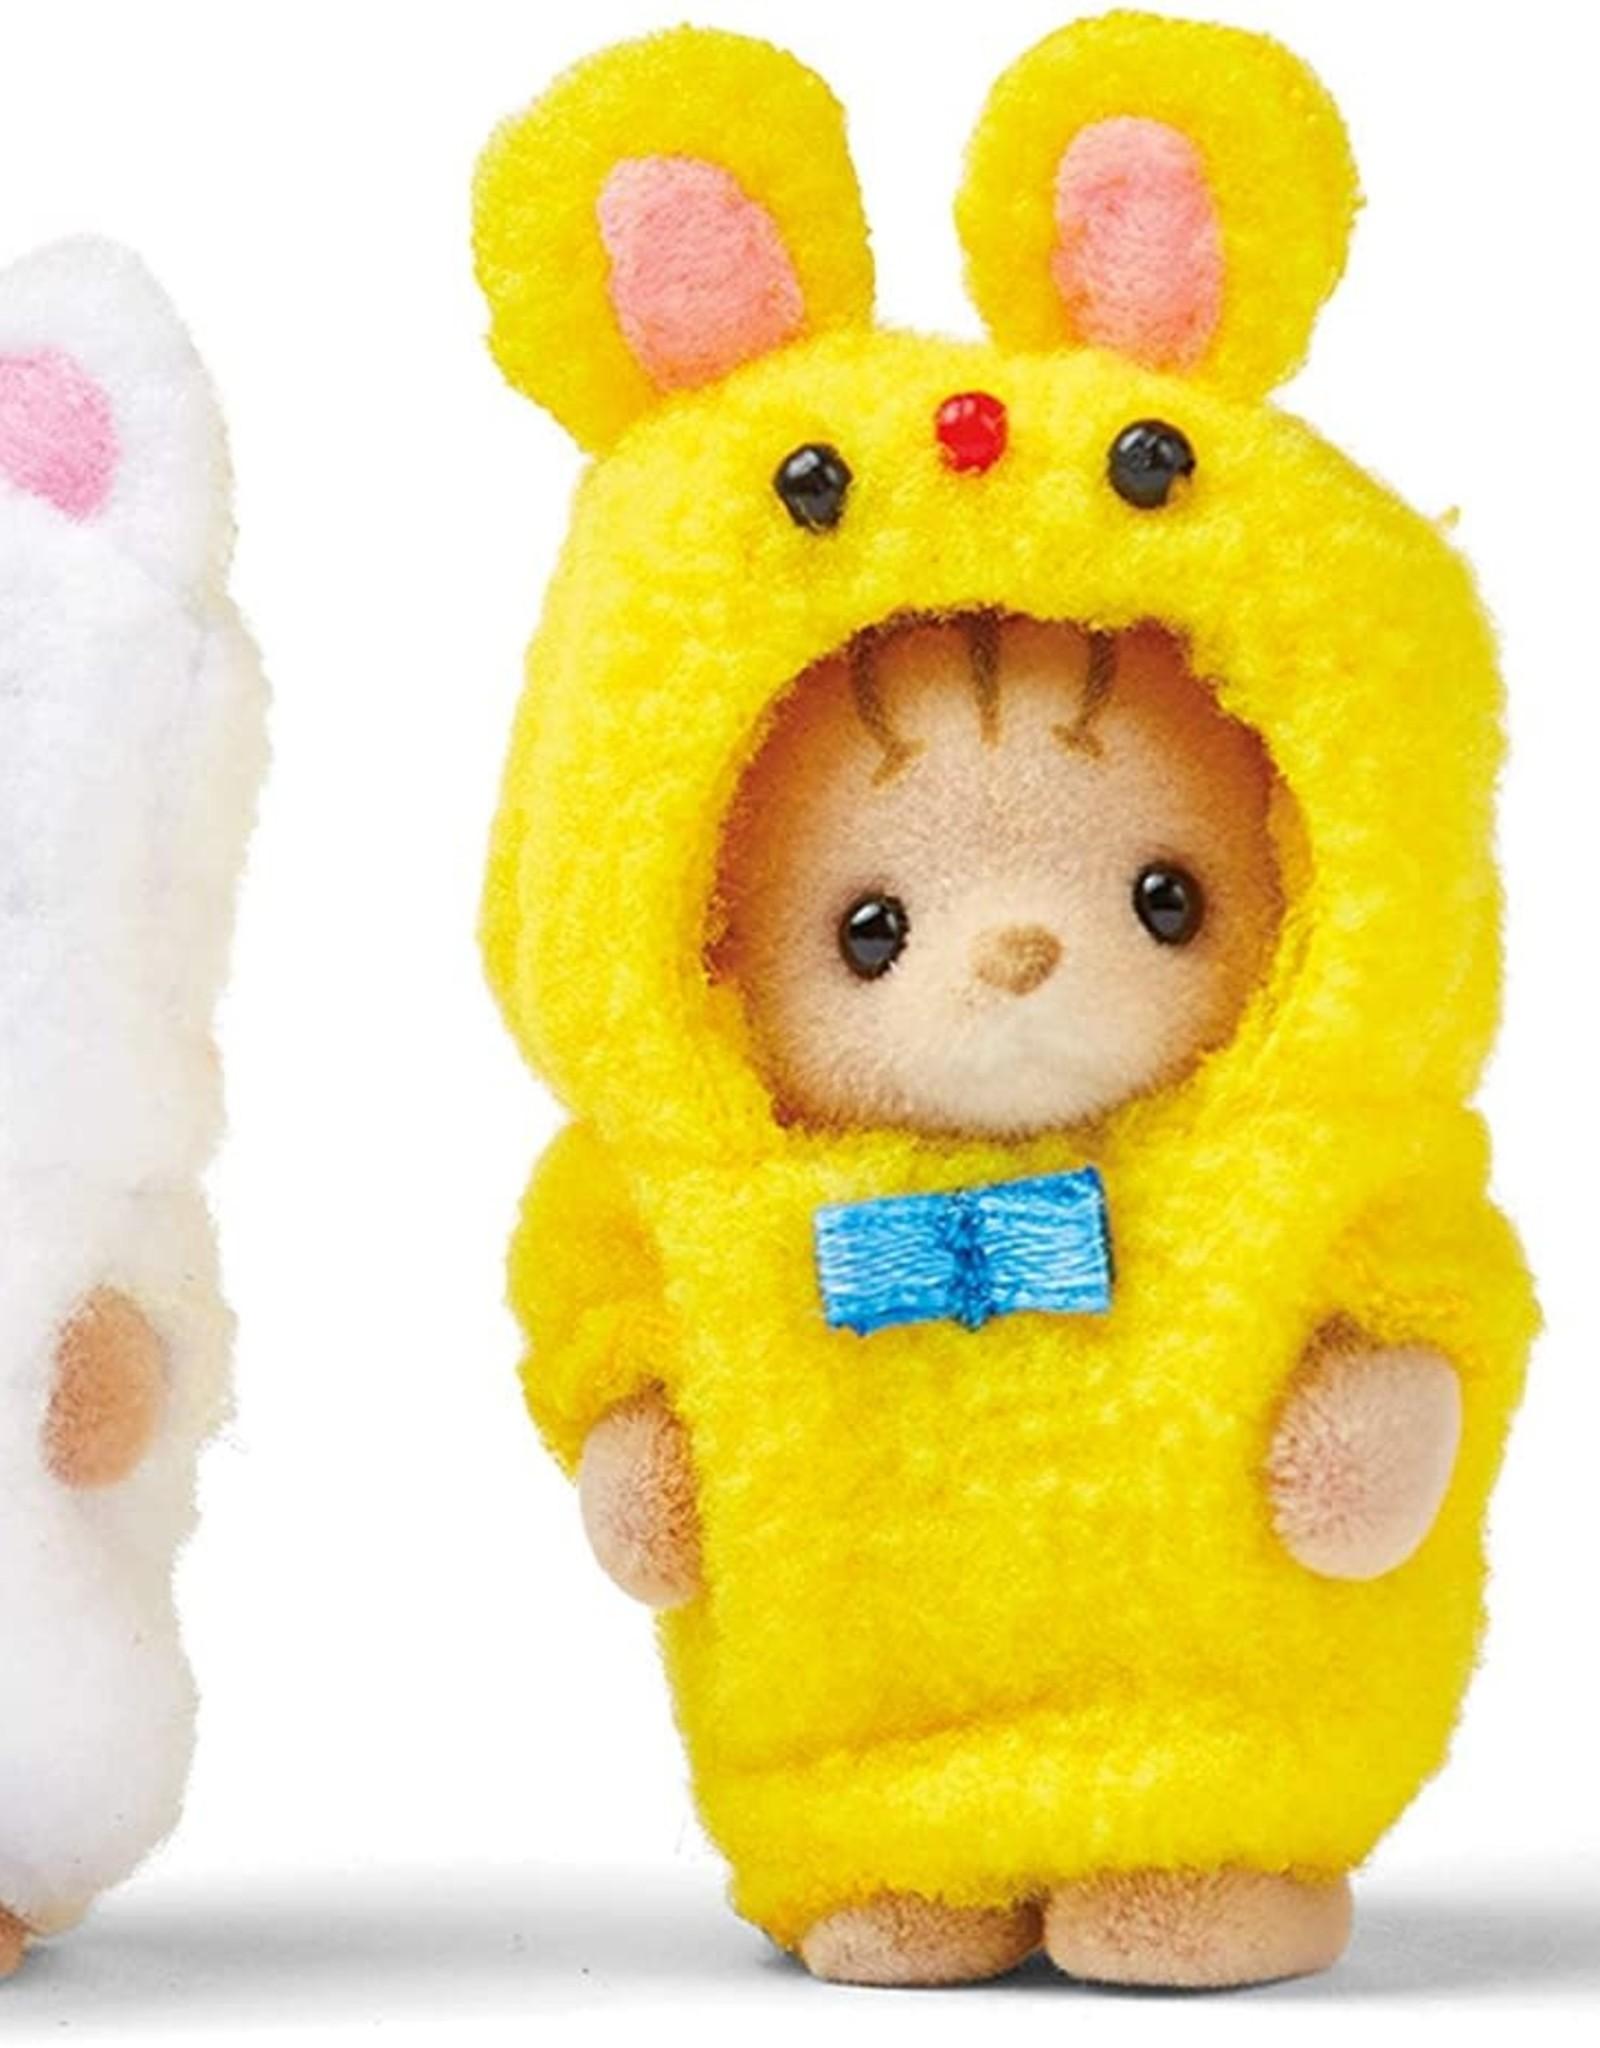 Calico Critters CC Costume Cuties Kitty & Cub